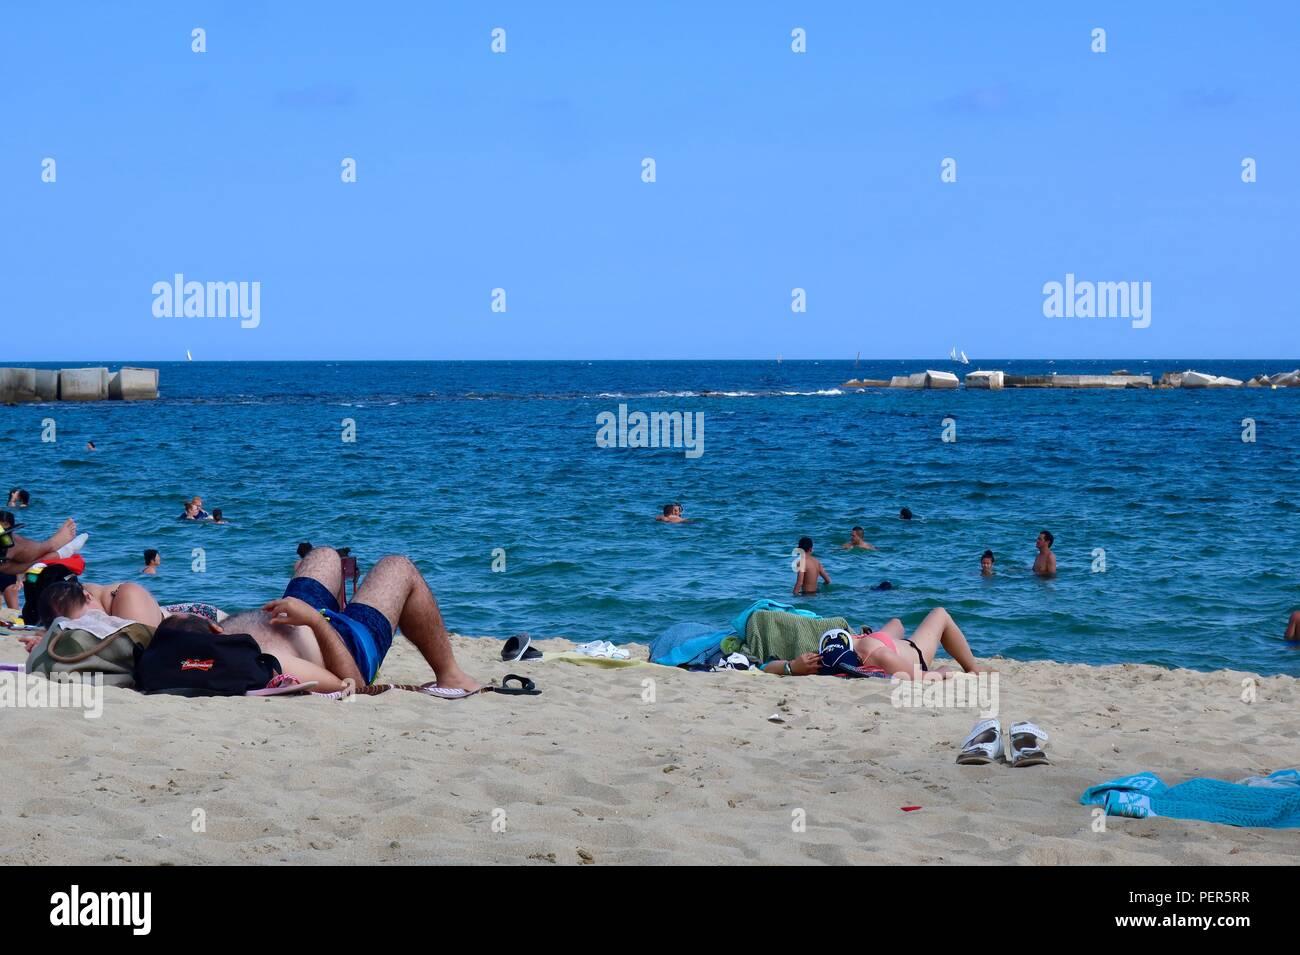 People enjoying platja de la nova icaria / nova icaria beach in Barcelona, Spain. Hot summer afternoon August 2018. - Stock Image